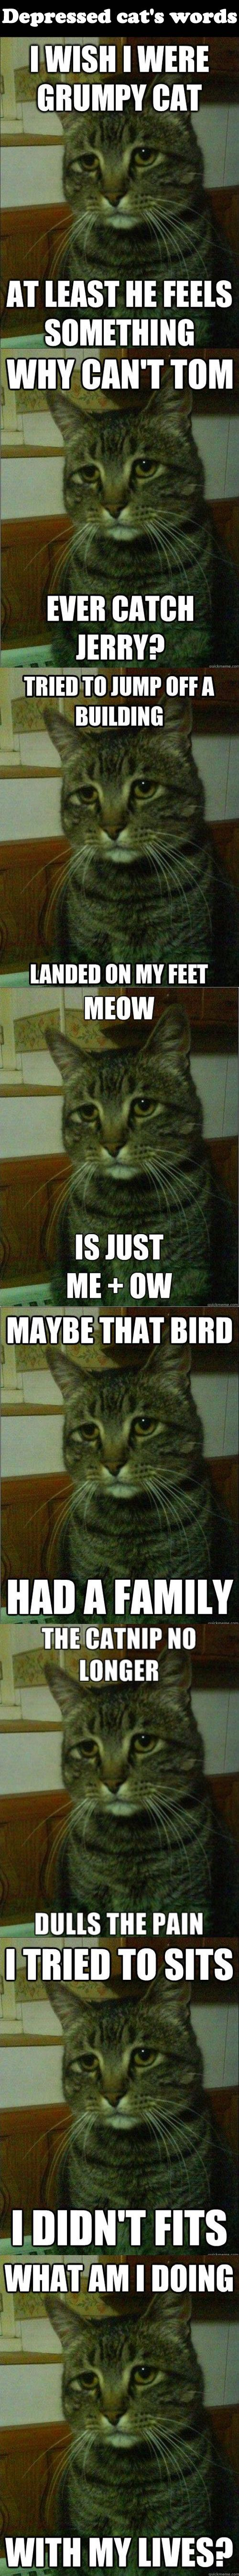 "Depressed cat's words make me sad. ""Me + ow""….now I'm depressed"